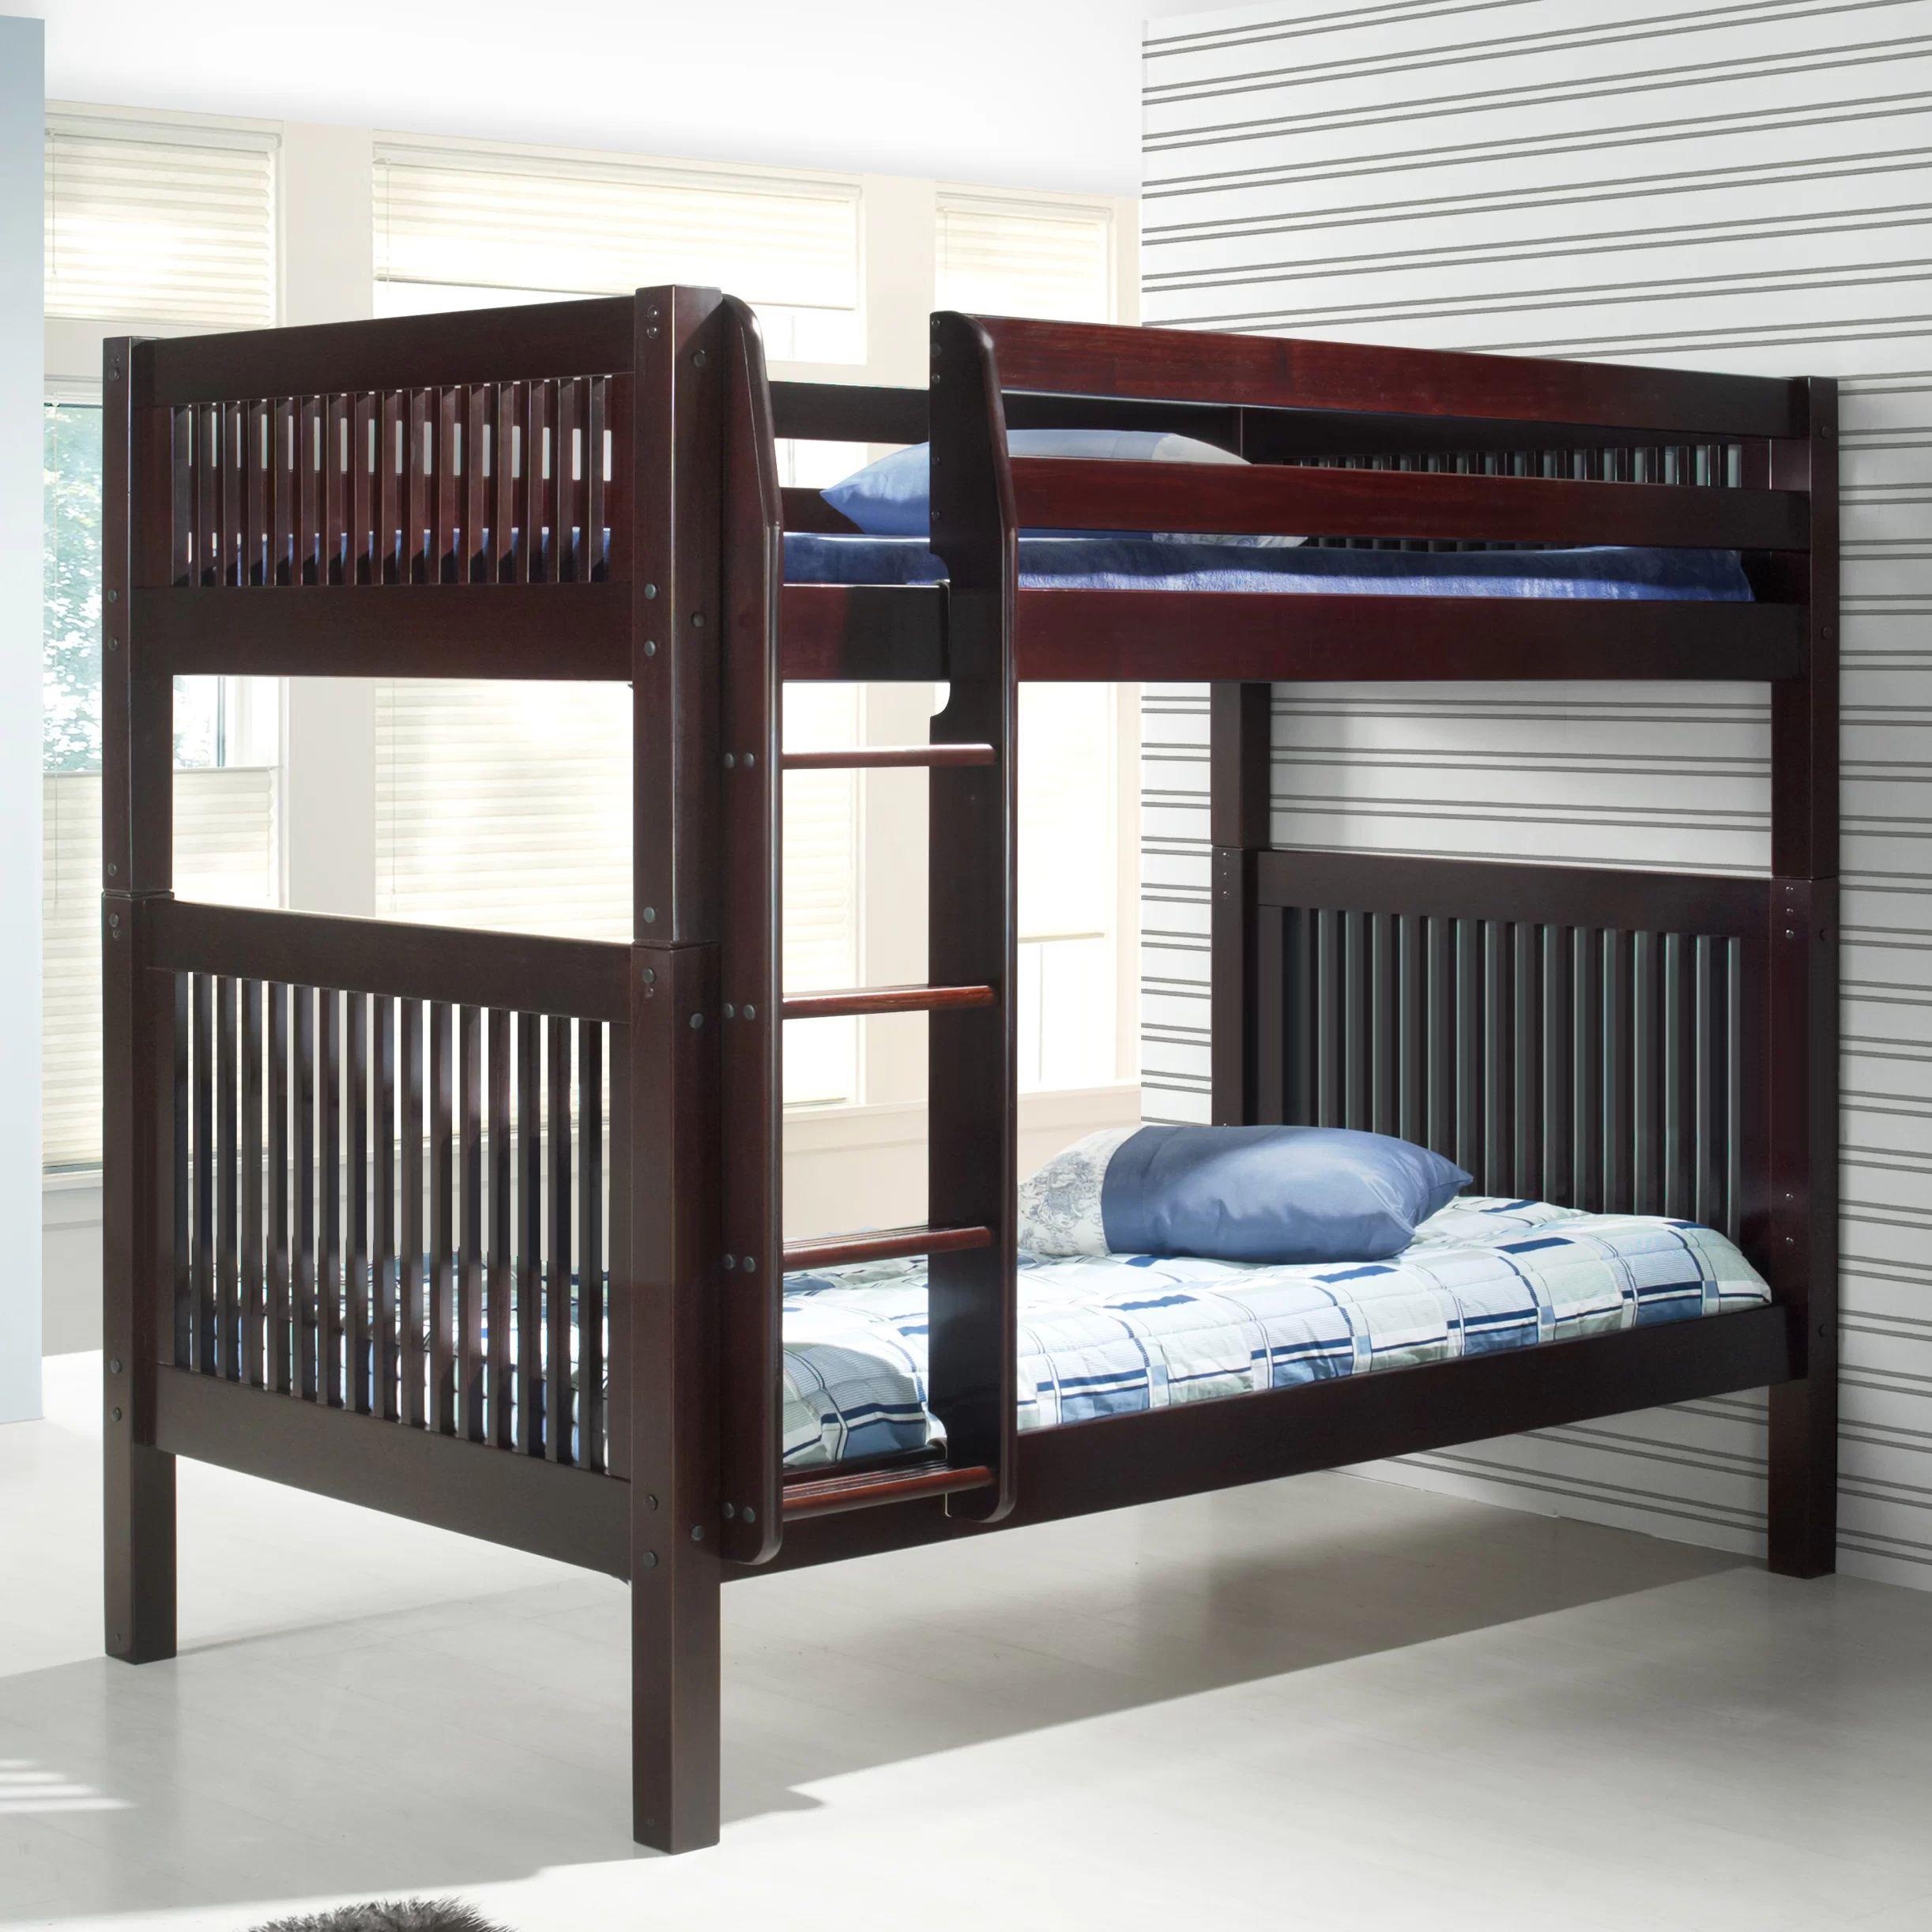 Camaflexi full over full bunk bed reviews